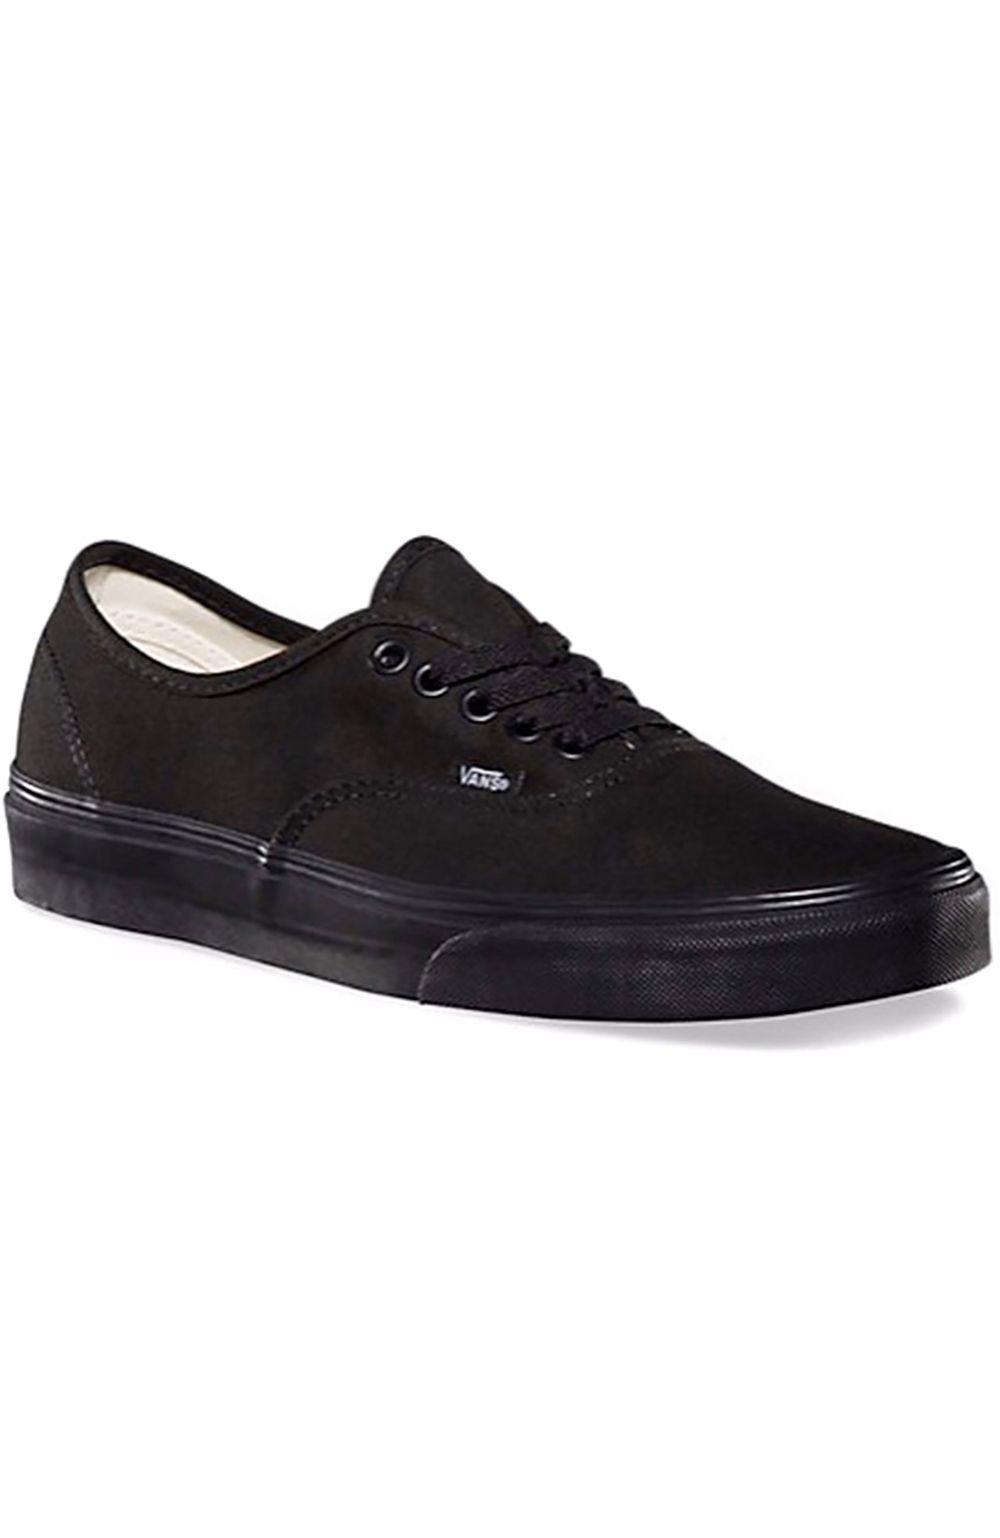 Tenis Vans AUTHENTIC Black/Black